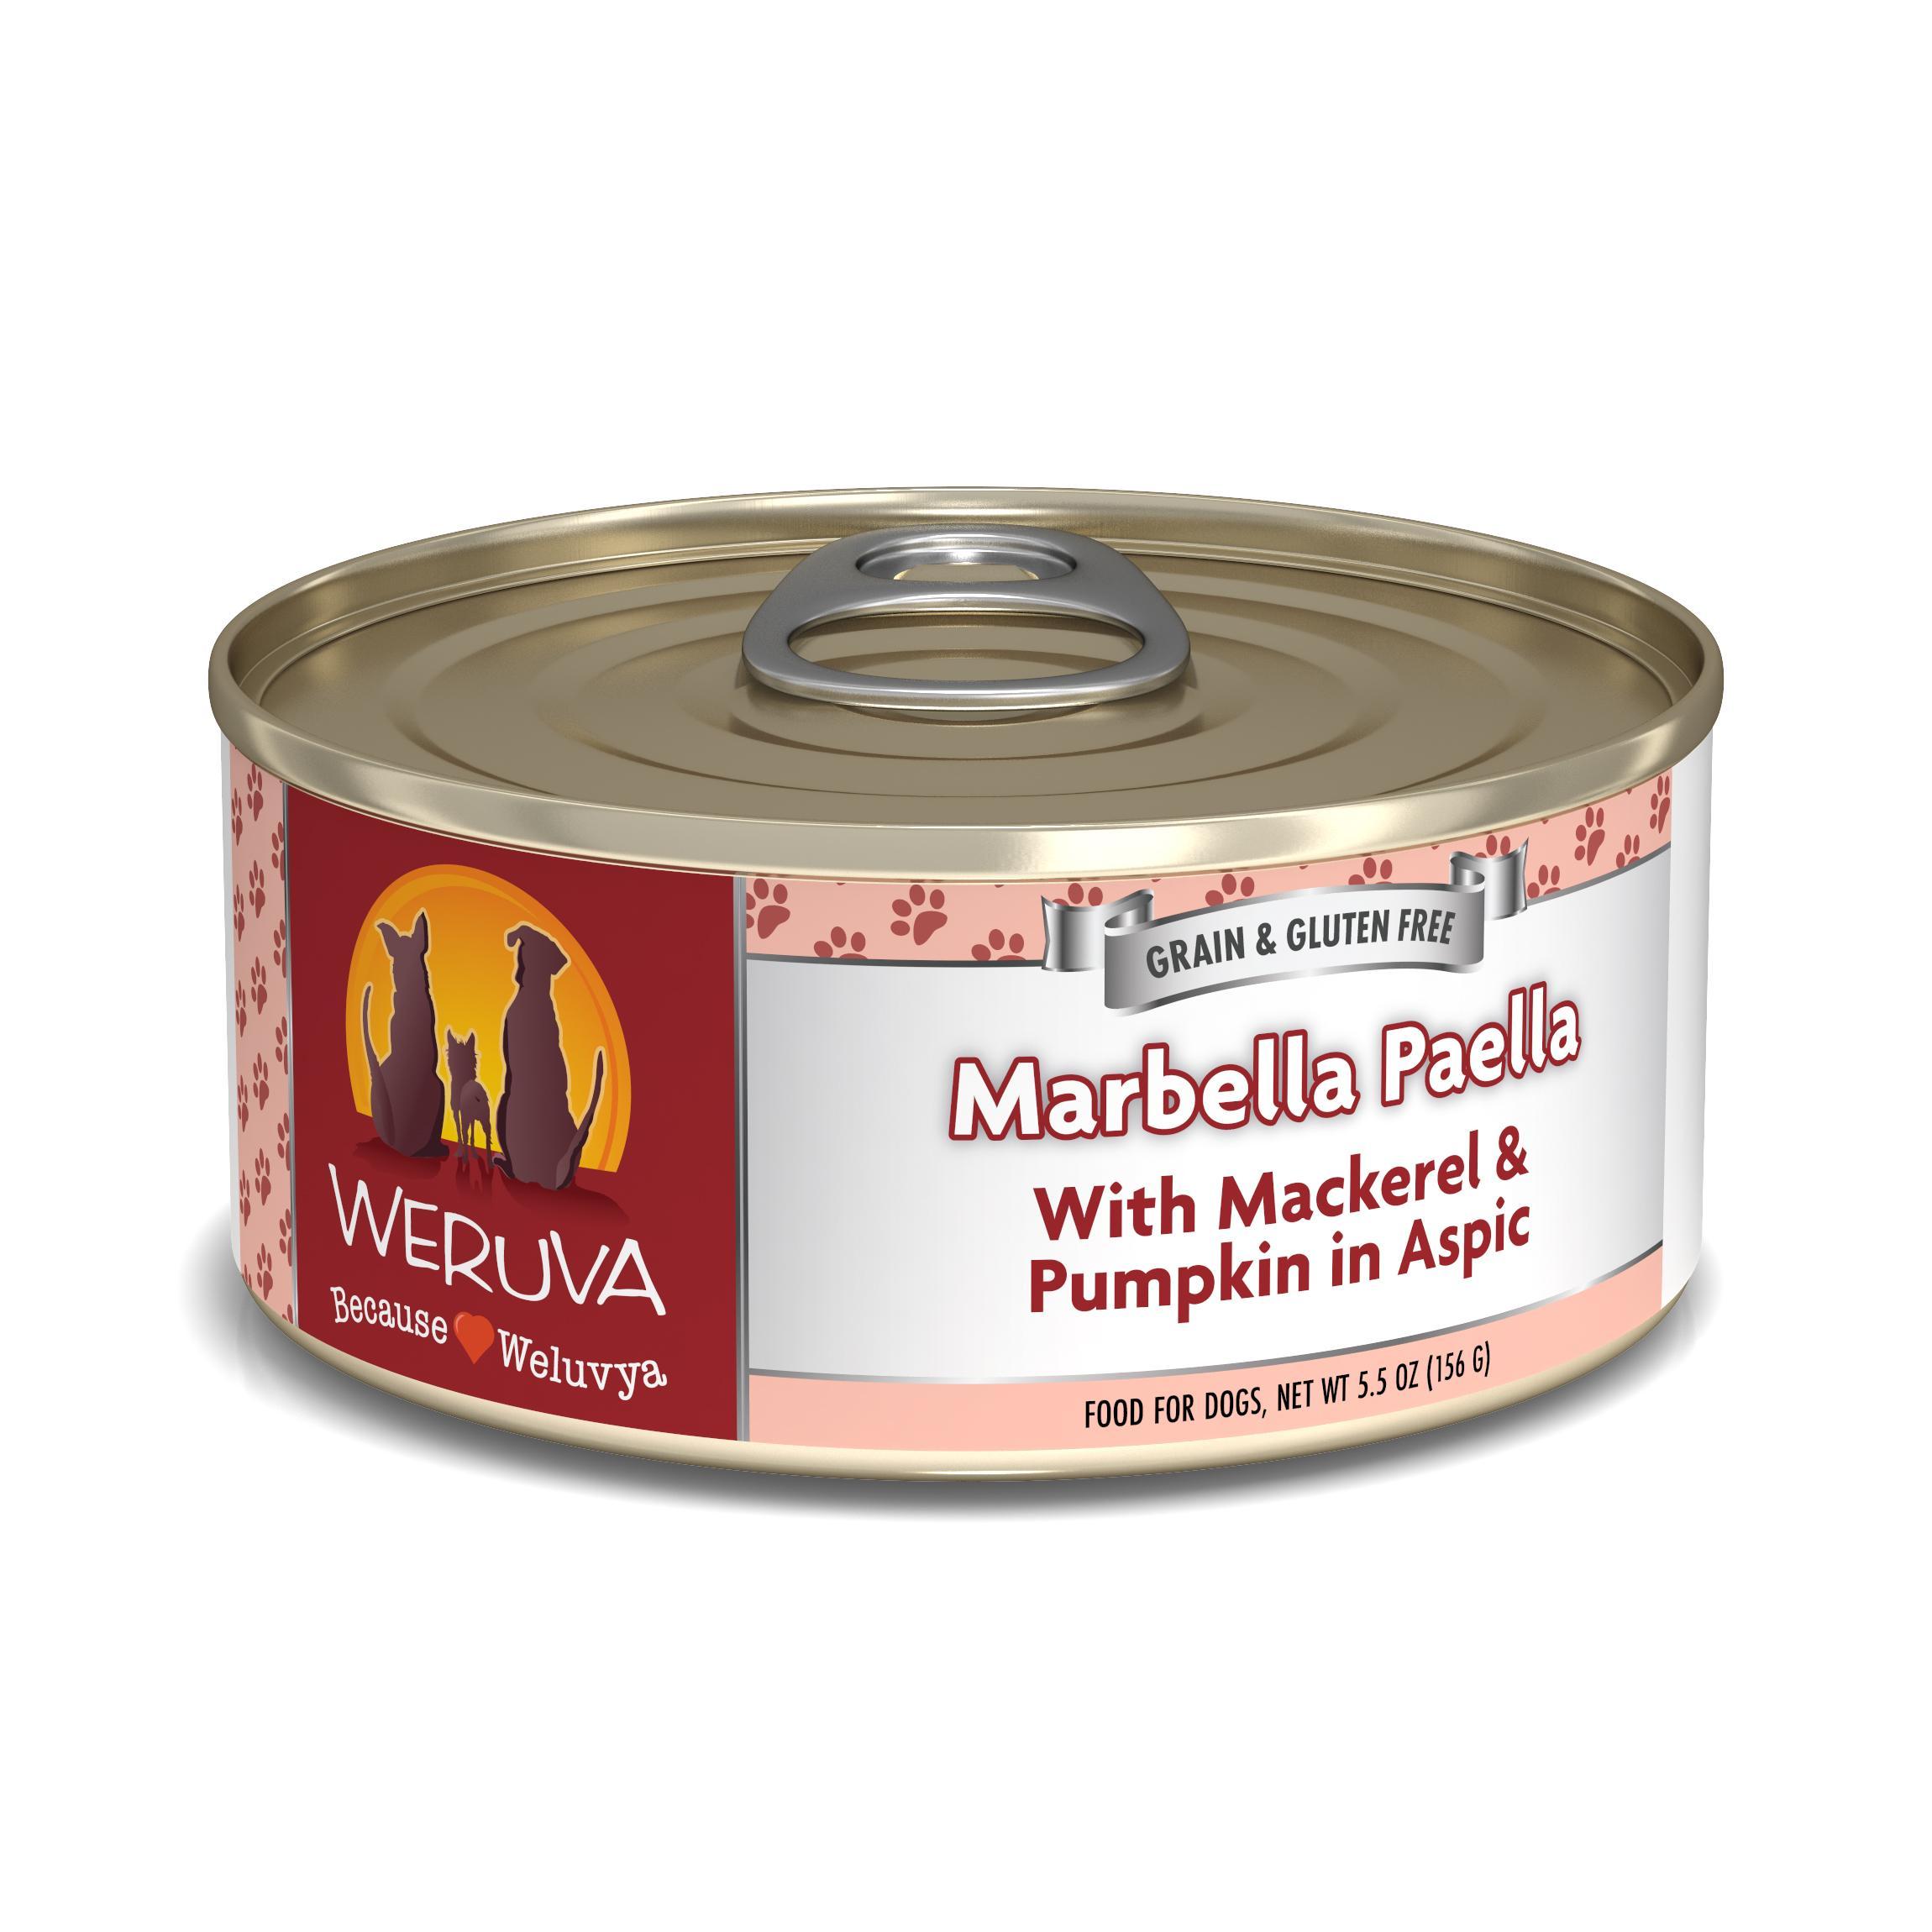 Weruva Dog Classic Marbella Paella with Mackerel & Pumpkin in Aspic Grain-Free Wet Dog Food, 5.5-oz